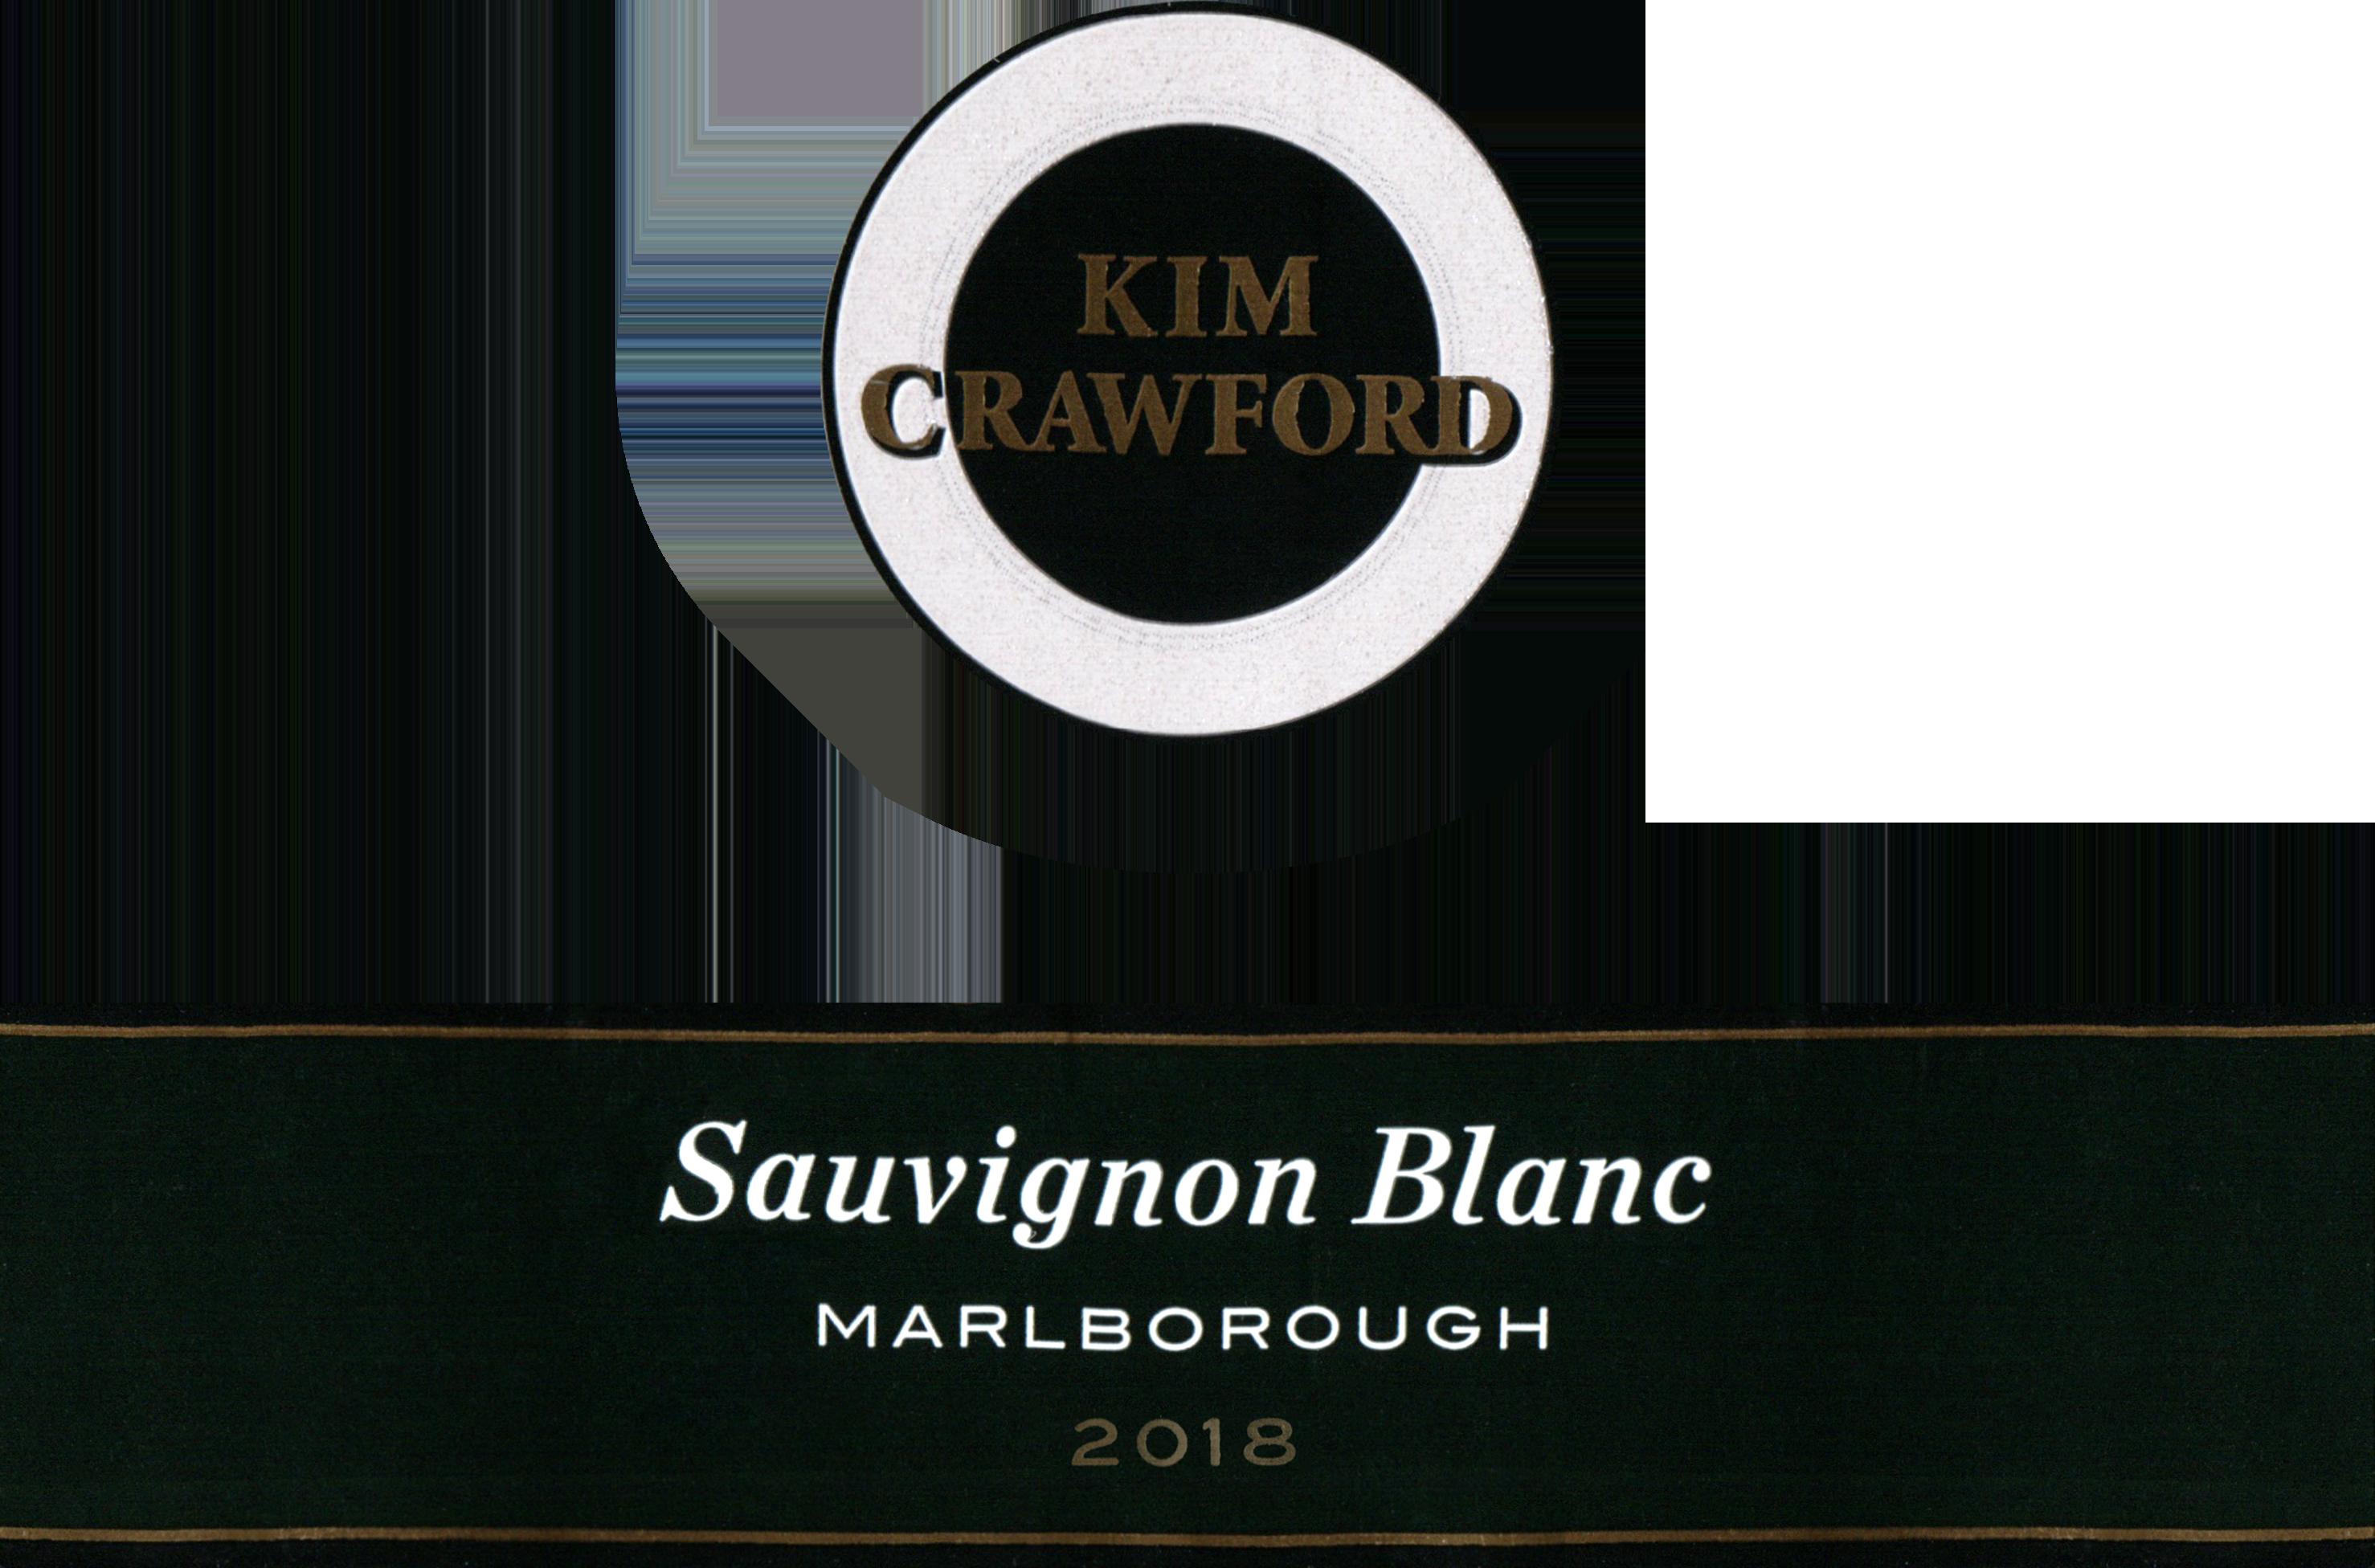 Kim Crawford Sauvignon Blanc Half Bottle 2018